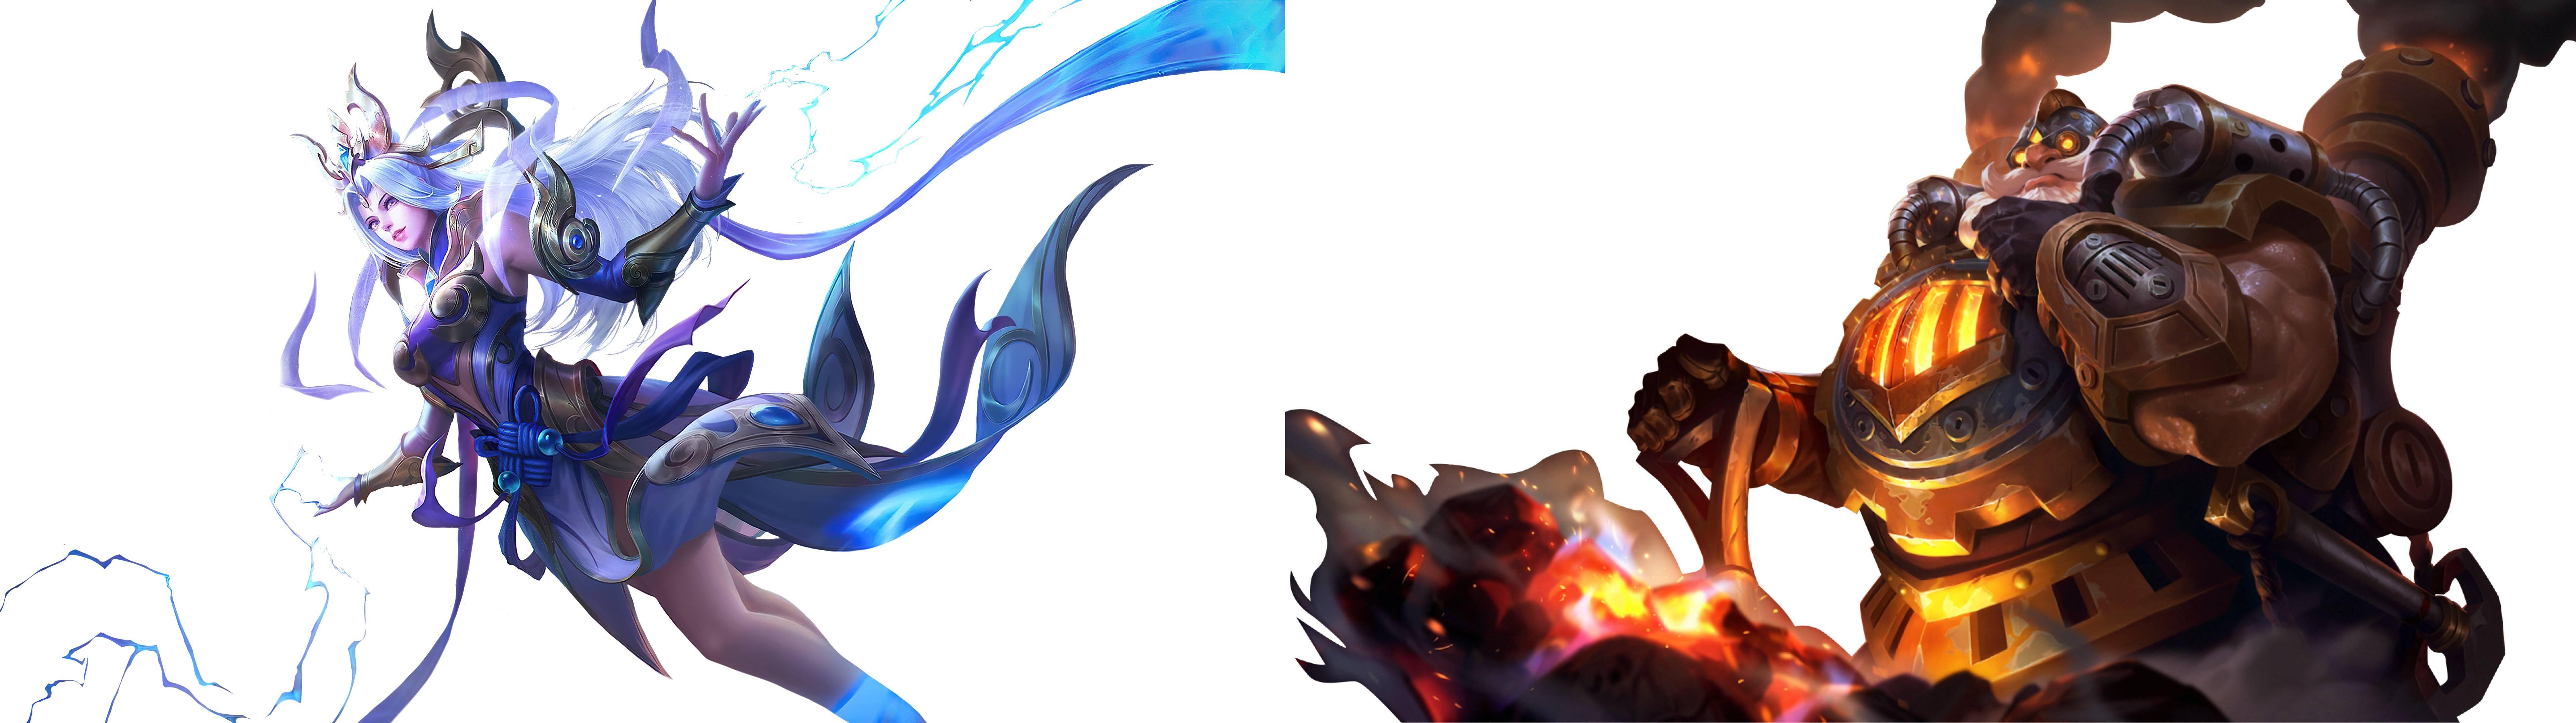 Mobile Legends Bang Bang: Best Heroes Combos